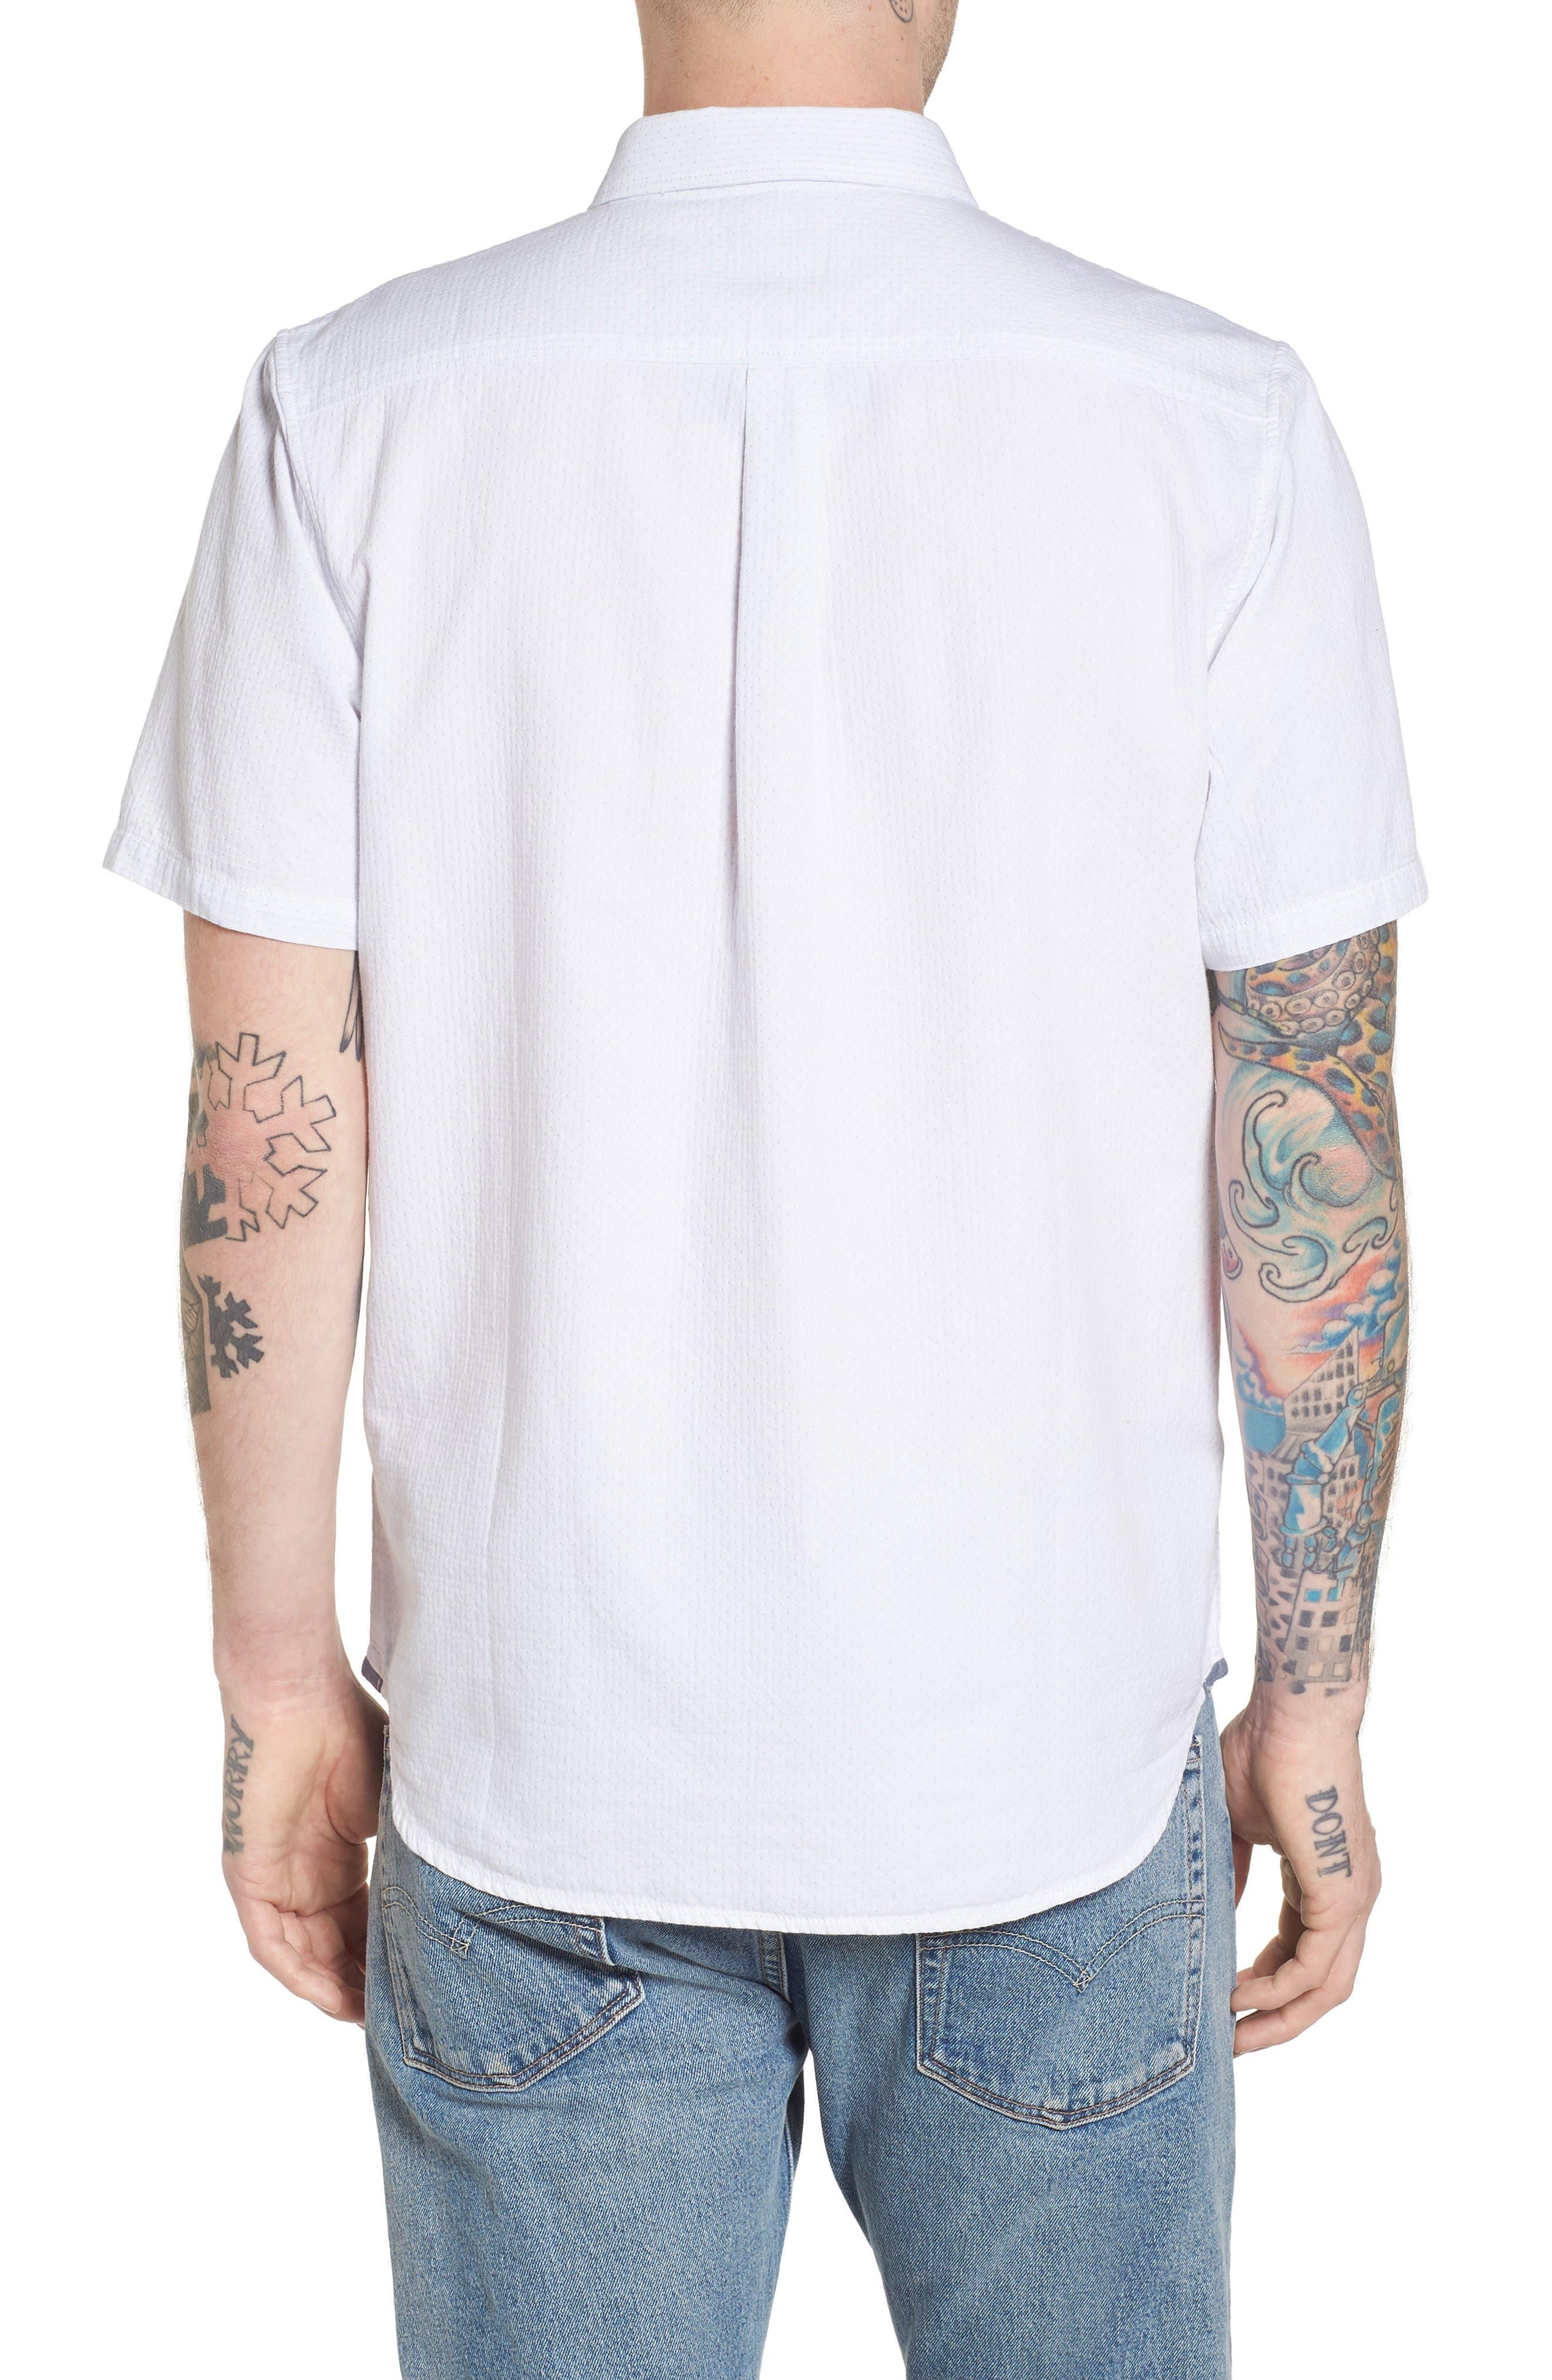 Fairdale Woven Shirt,                             Alternate thumbnail 3, color,                             White